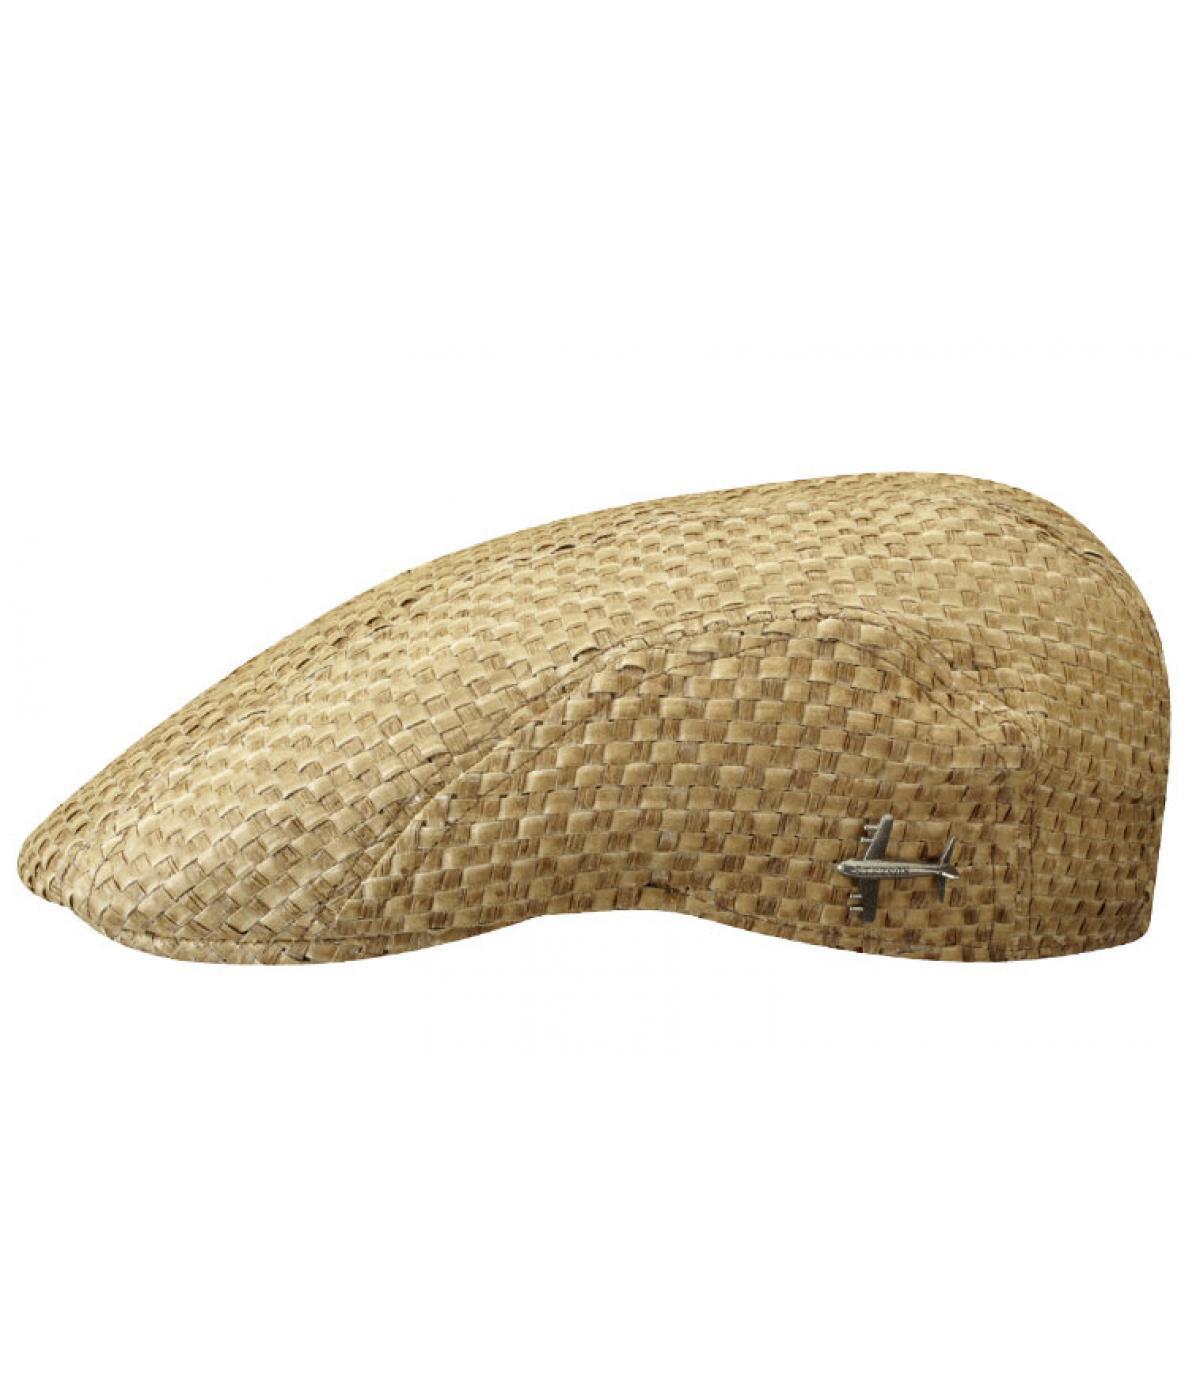 Stetson straw flat cap